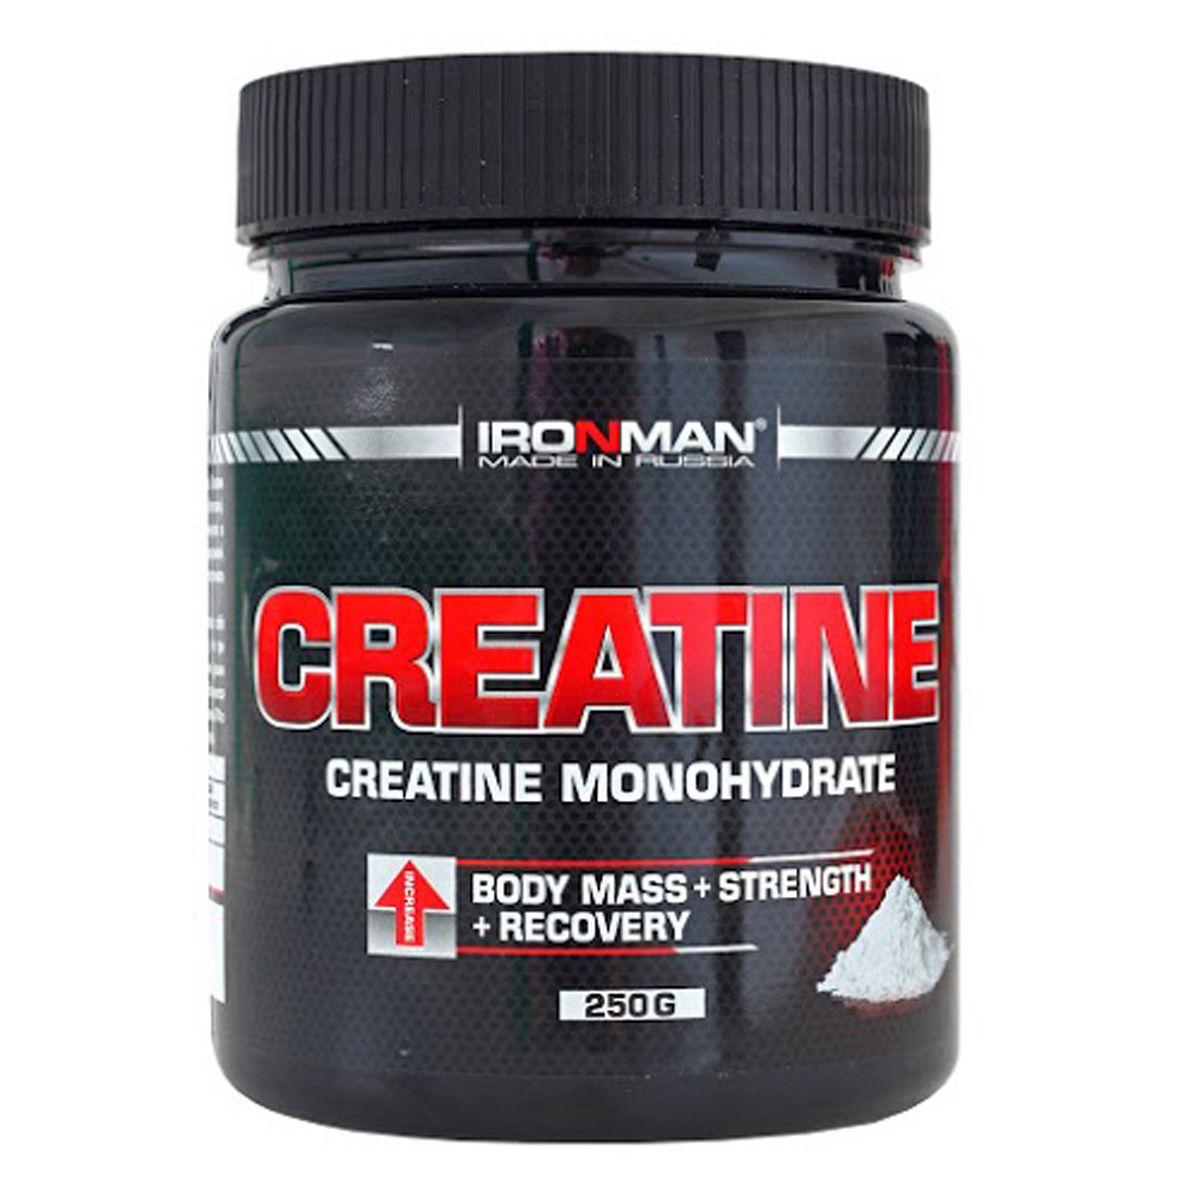 Креатин моногидрат Ironman Креатин, 250 г dymatize nutrition моногидрат креатина dymatize creatine micronized 500гр